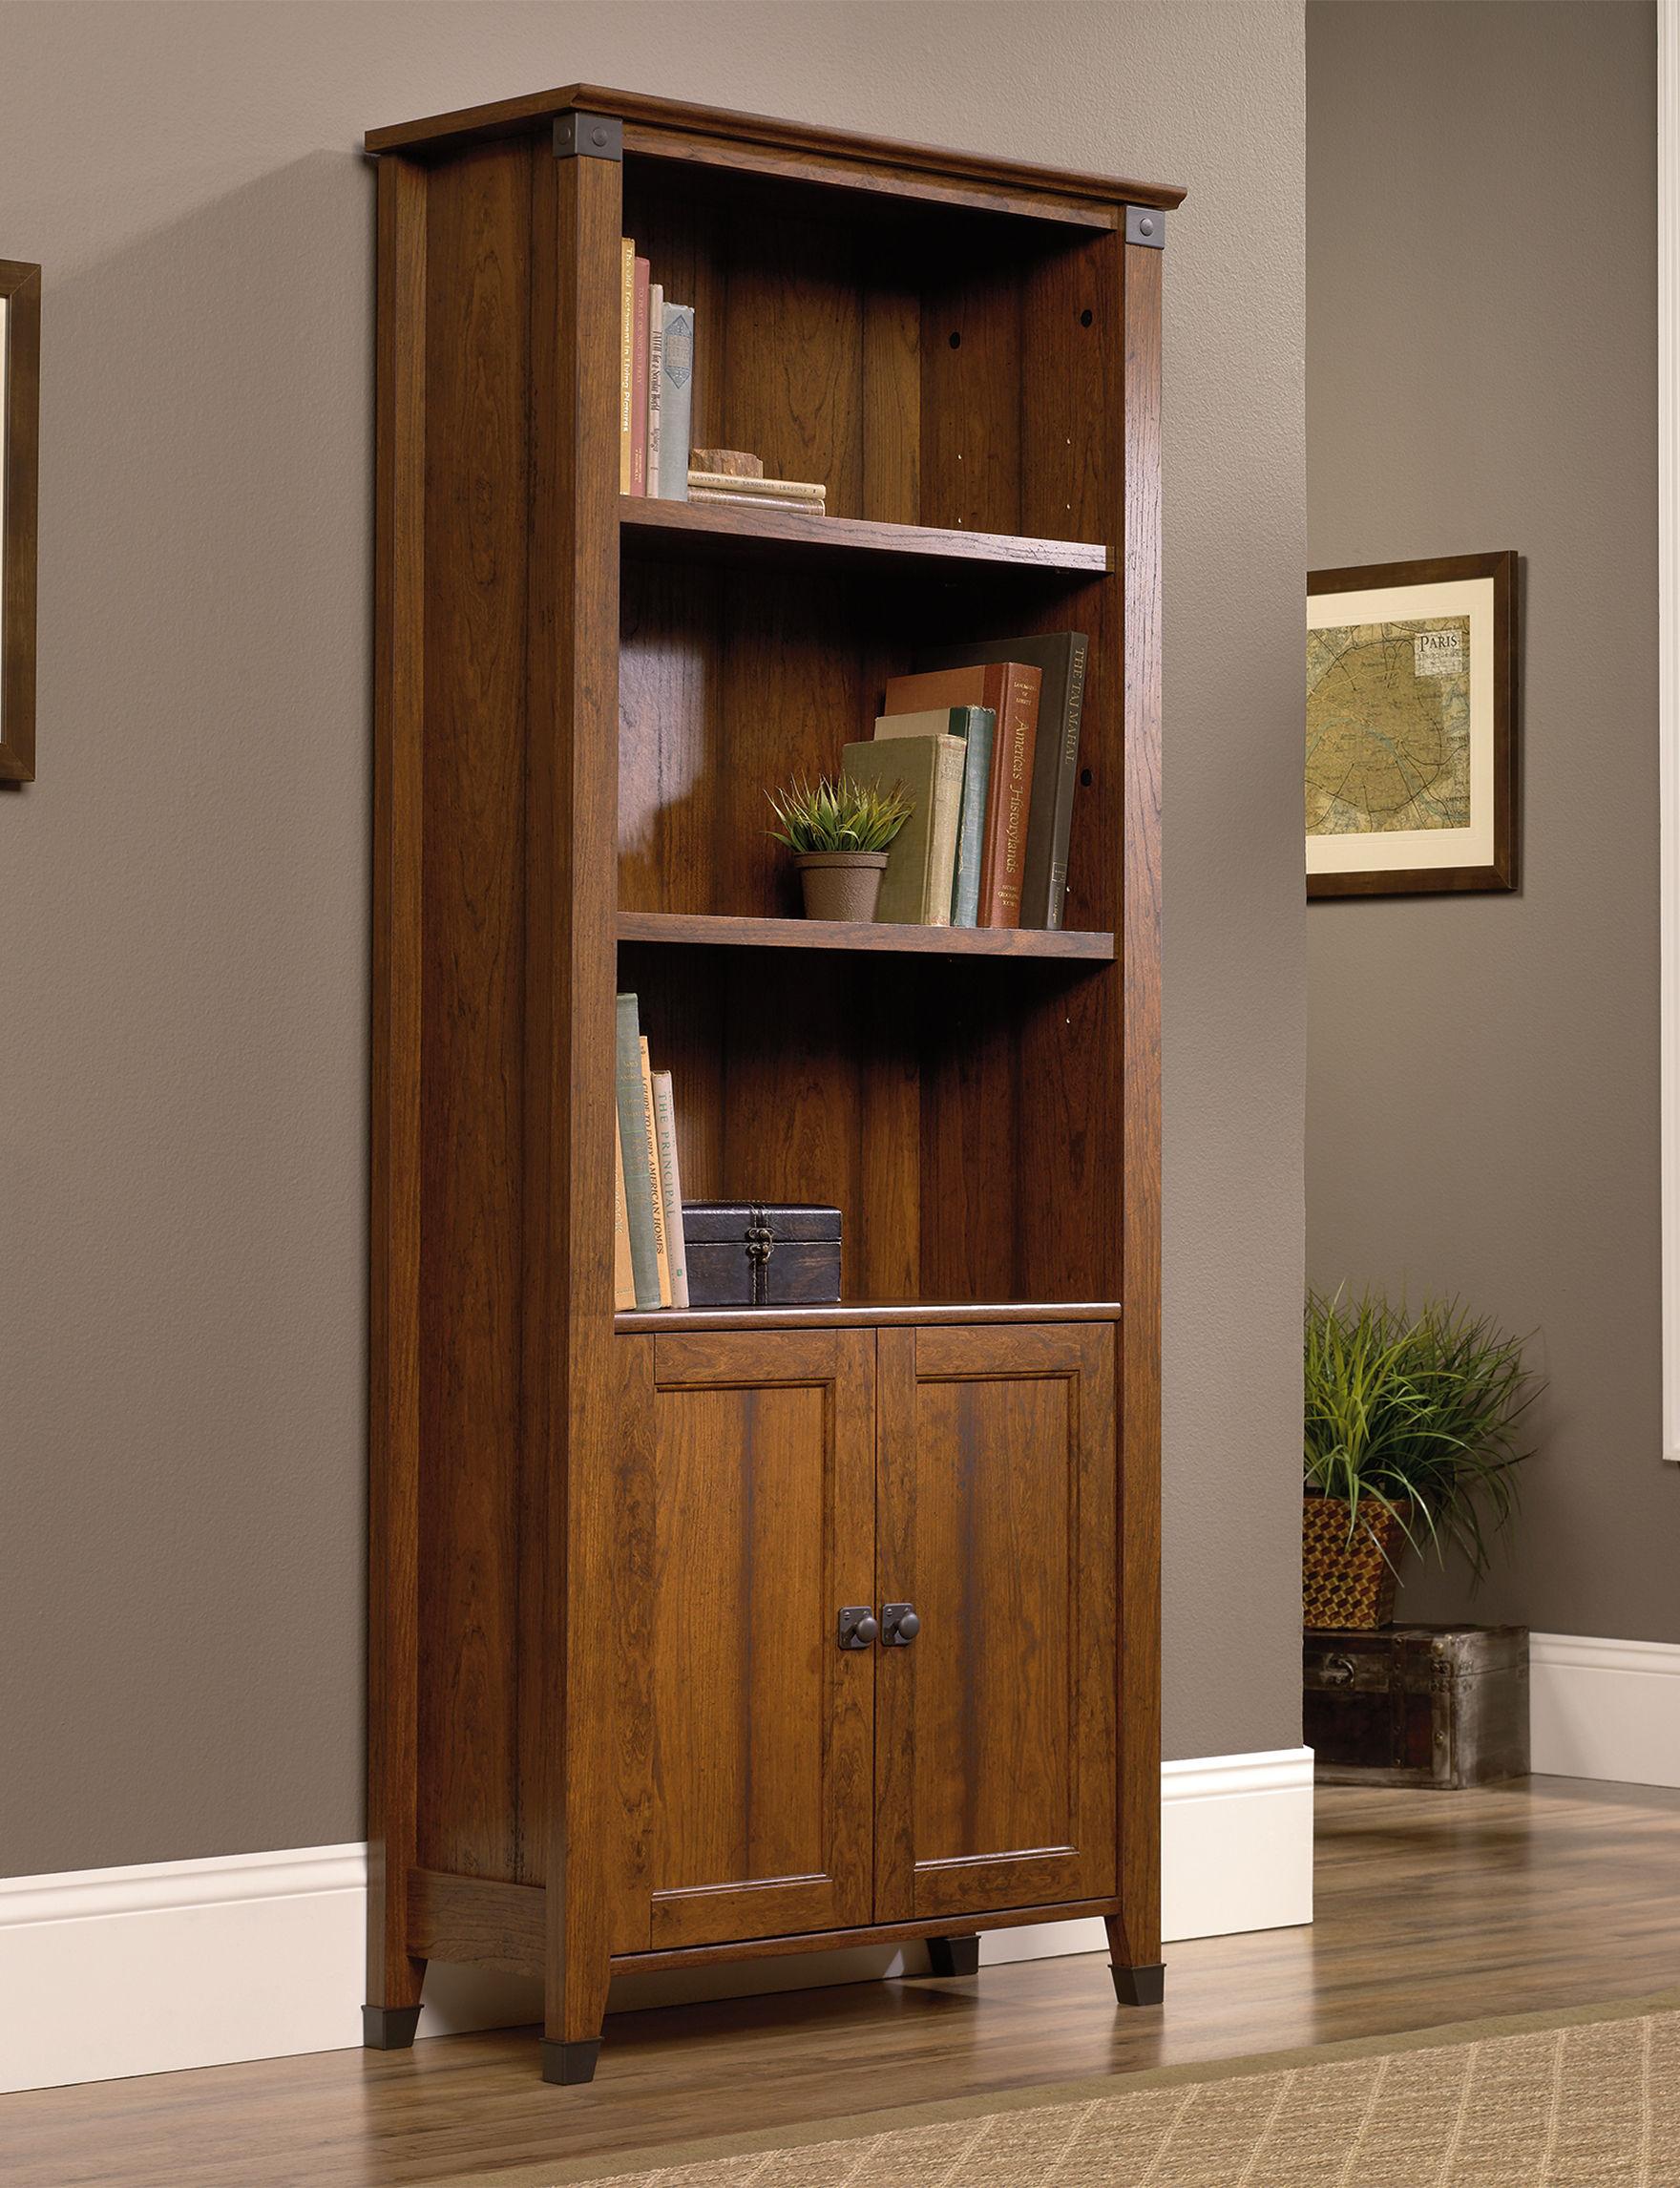 Sauder Brown Dressers & Chests Living Room Furniture